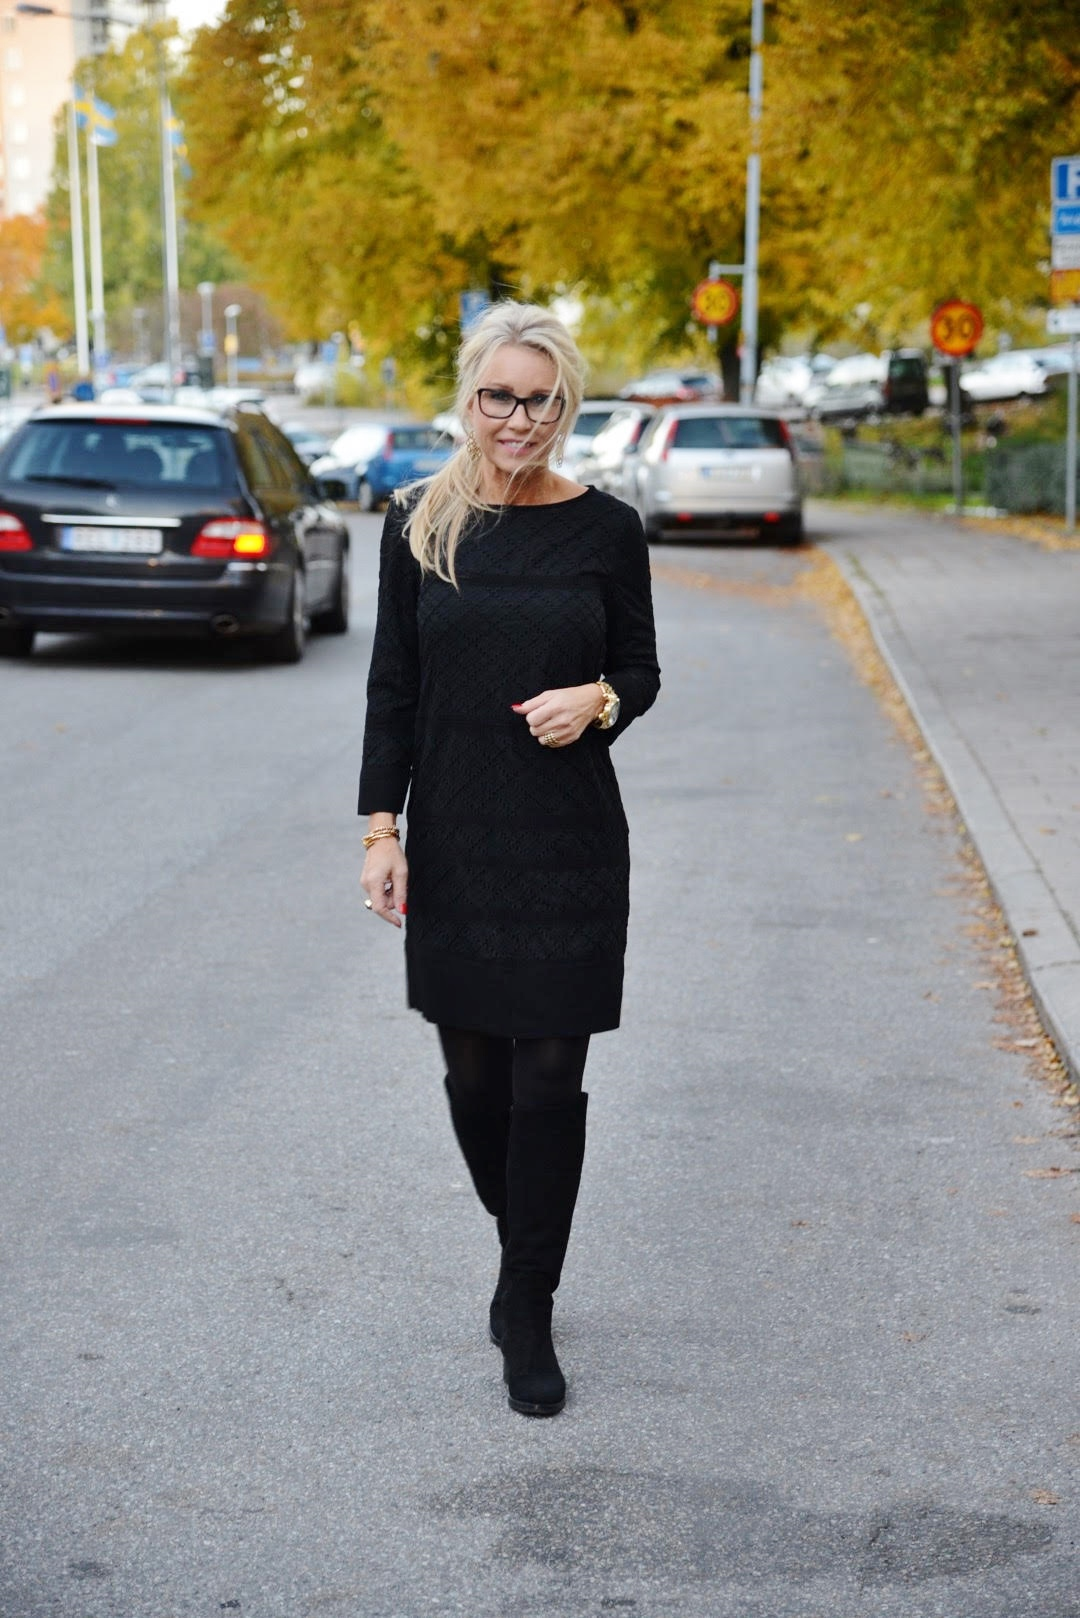 1c7b64763bc0 Kappa MORRIS halsduk Louis Vuitton klänning Day Tullhuset moccastövlar  Marzio